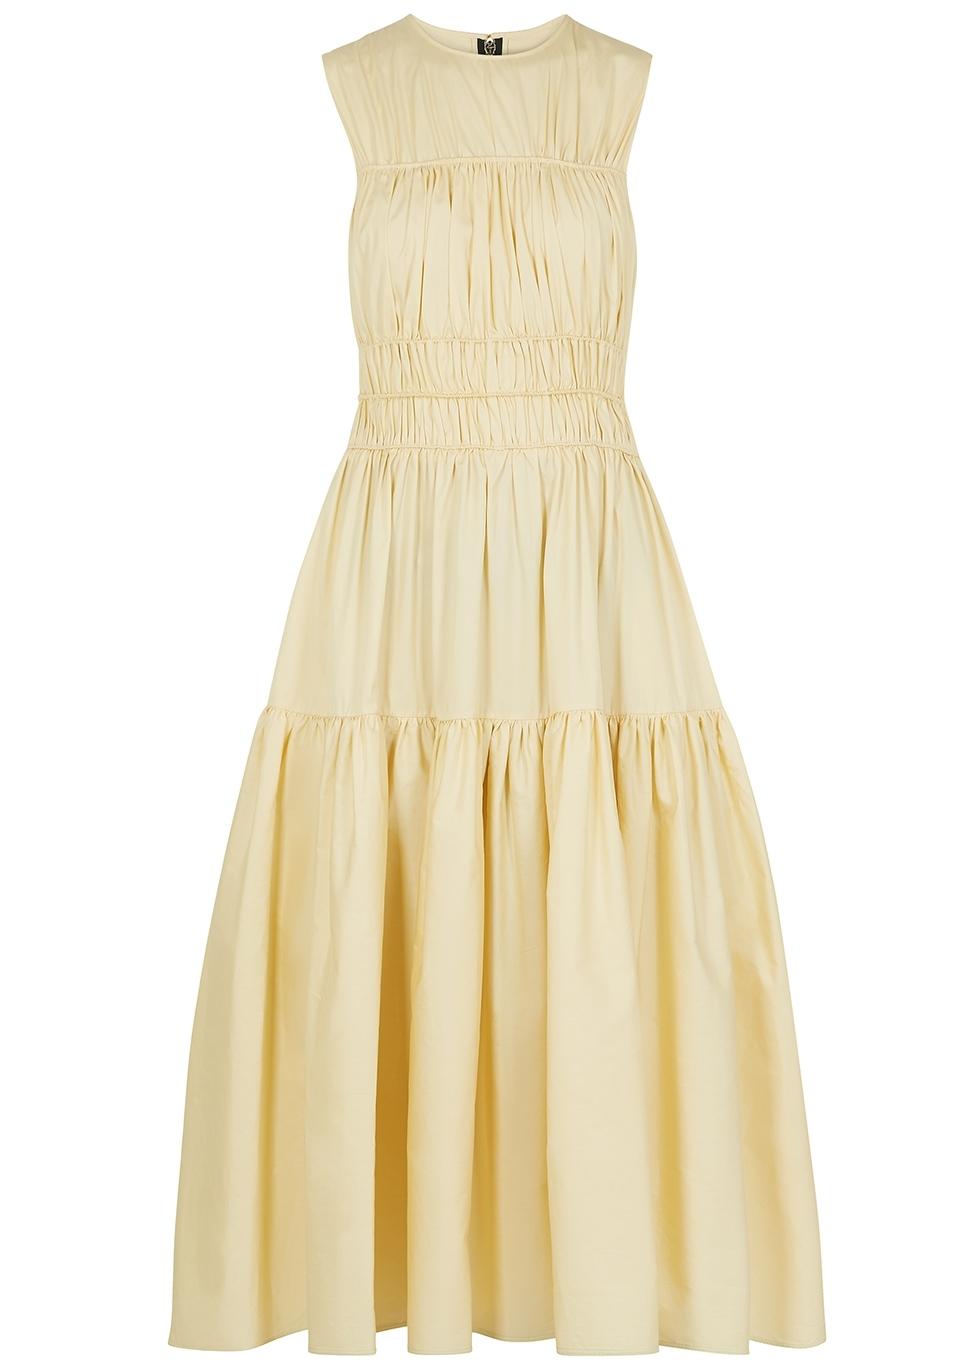 a4618c9e47ba Designer Dresses & Designer Gowns - Harvey Nichols